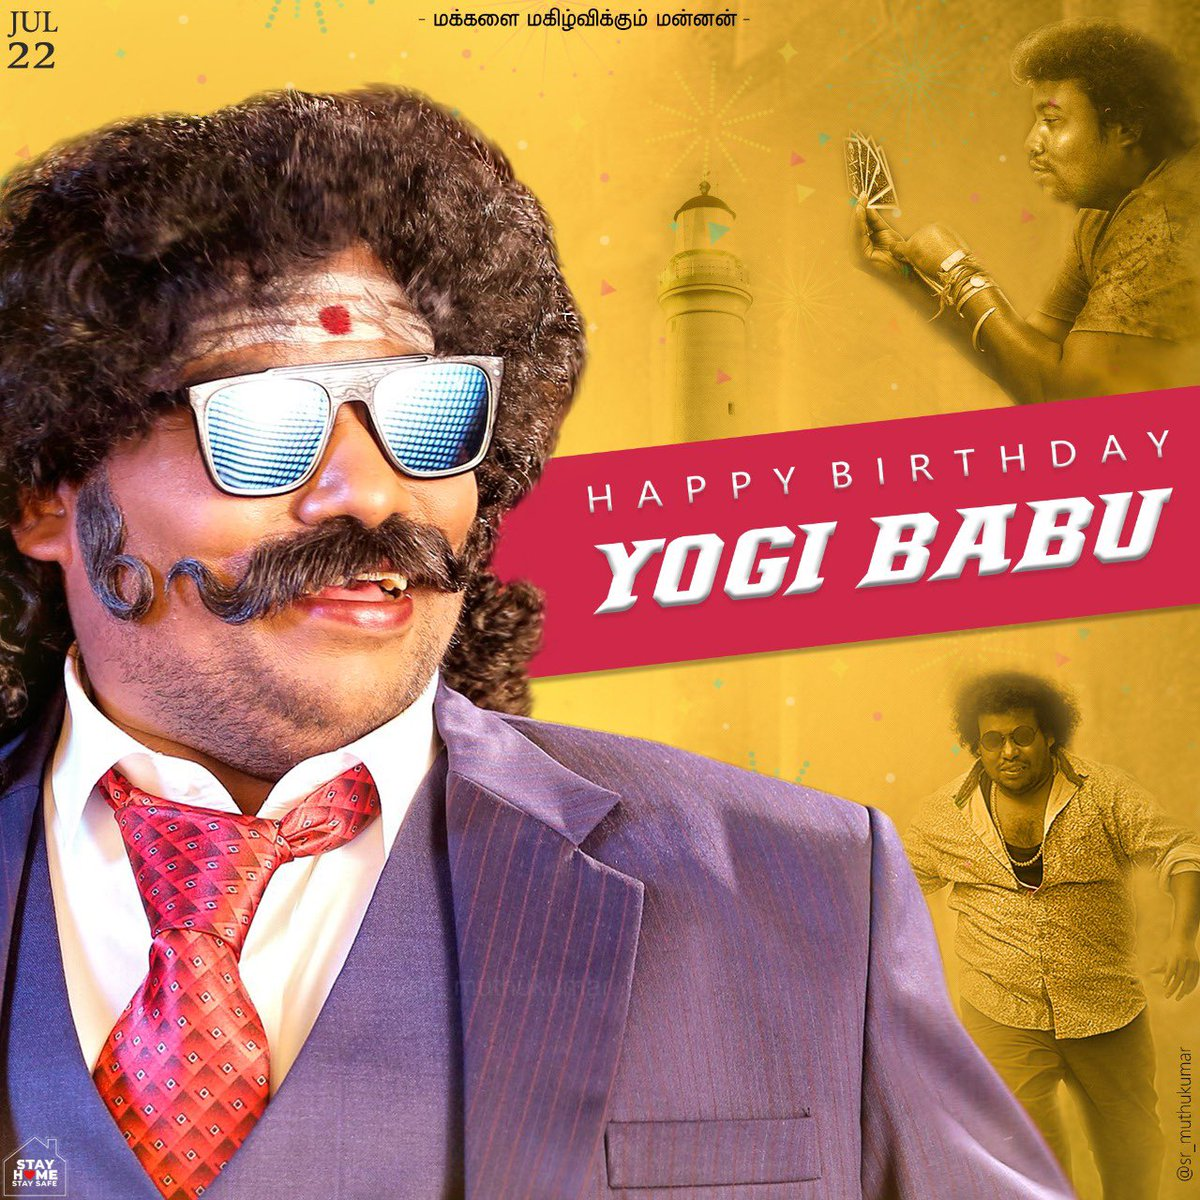 Happy to Release Common DP for Actor @iYogiBabu Birthday Celebration #YogiBabu  Design by - @sr_muthukumar  Organised by - @FXSHARAN @Aswin798  #HBDYogiBabu #YogibabuBirthdayCDP https://t.co/0Mpj2lzlln